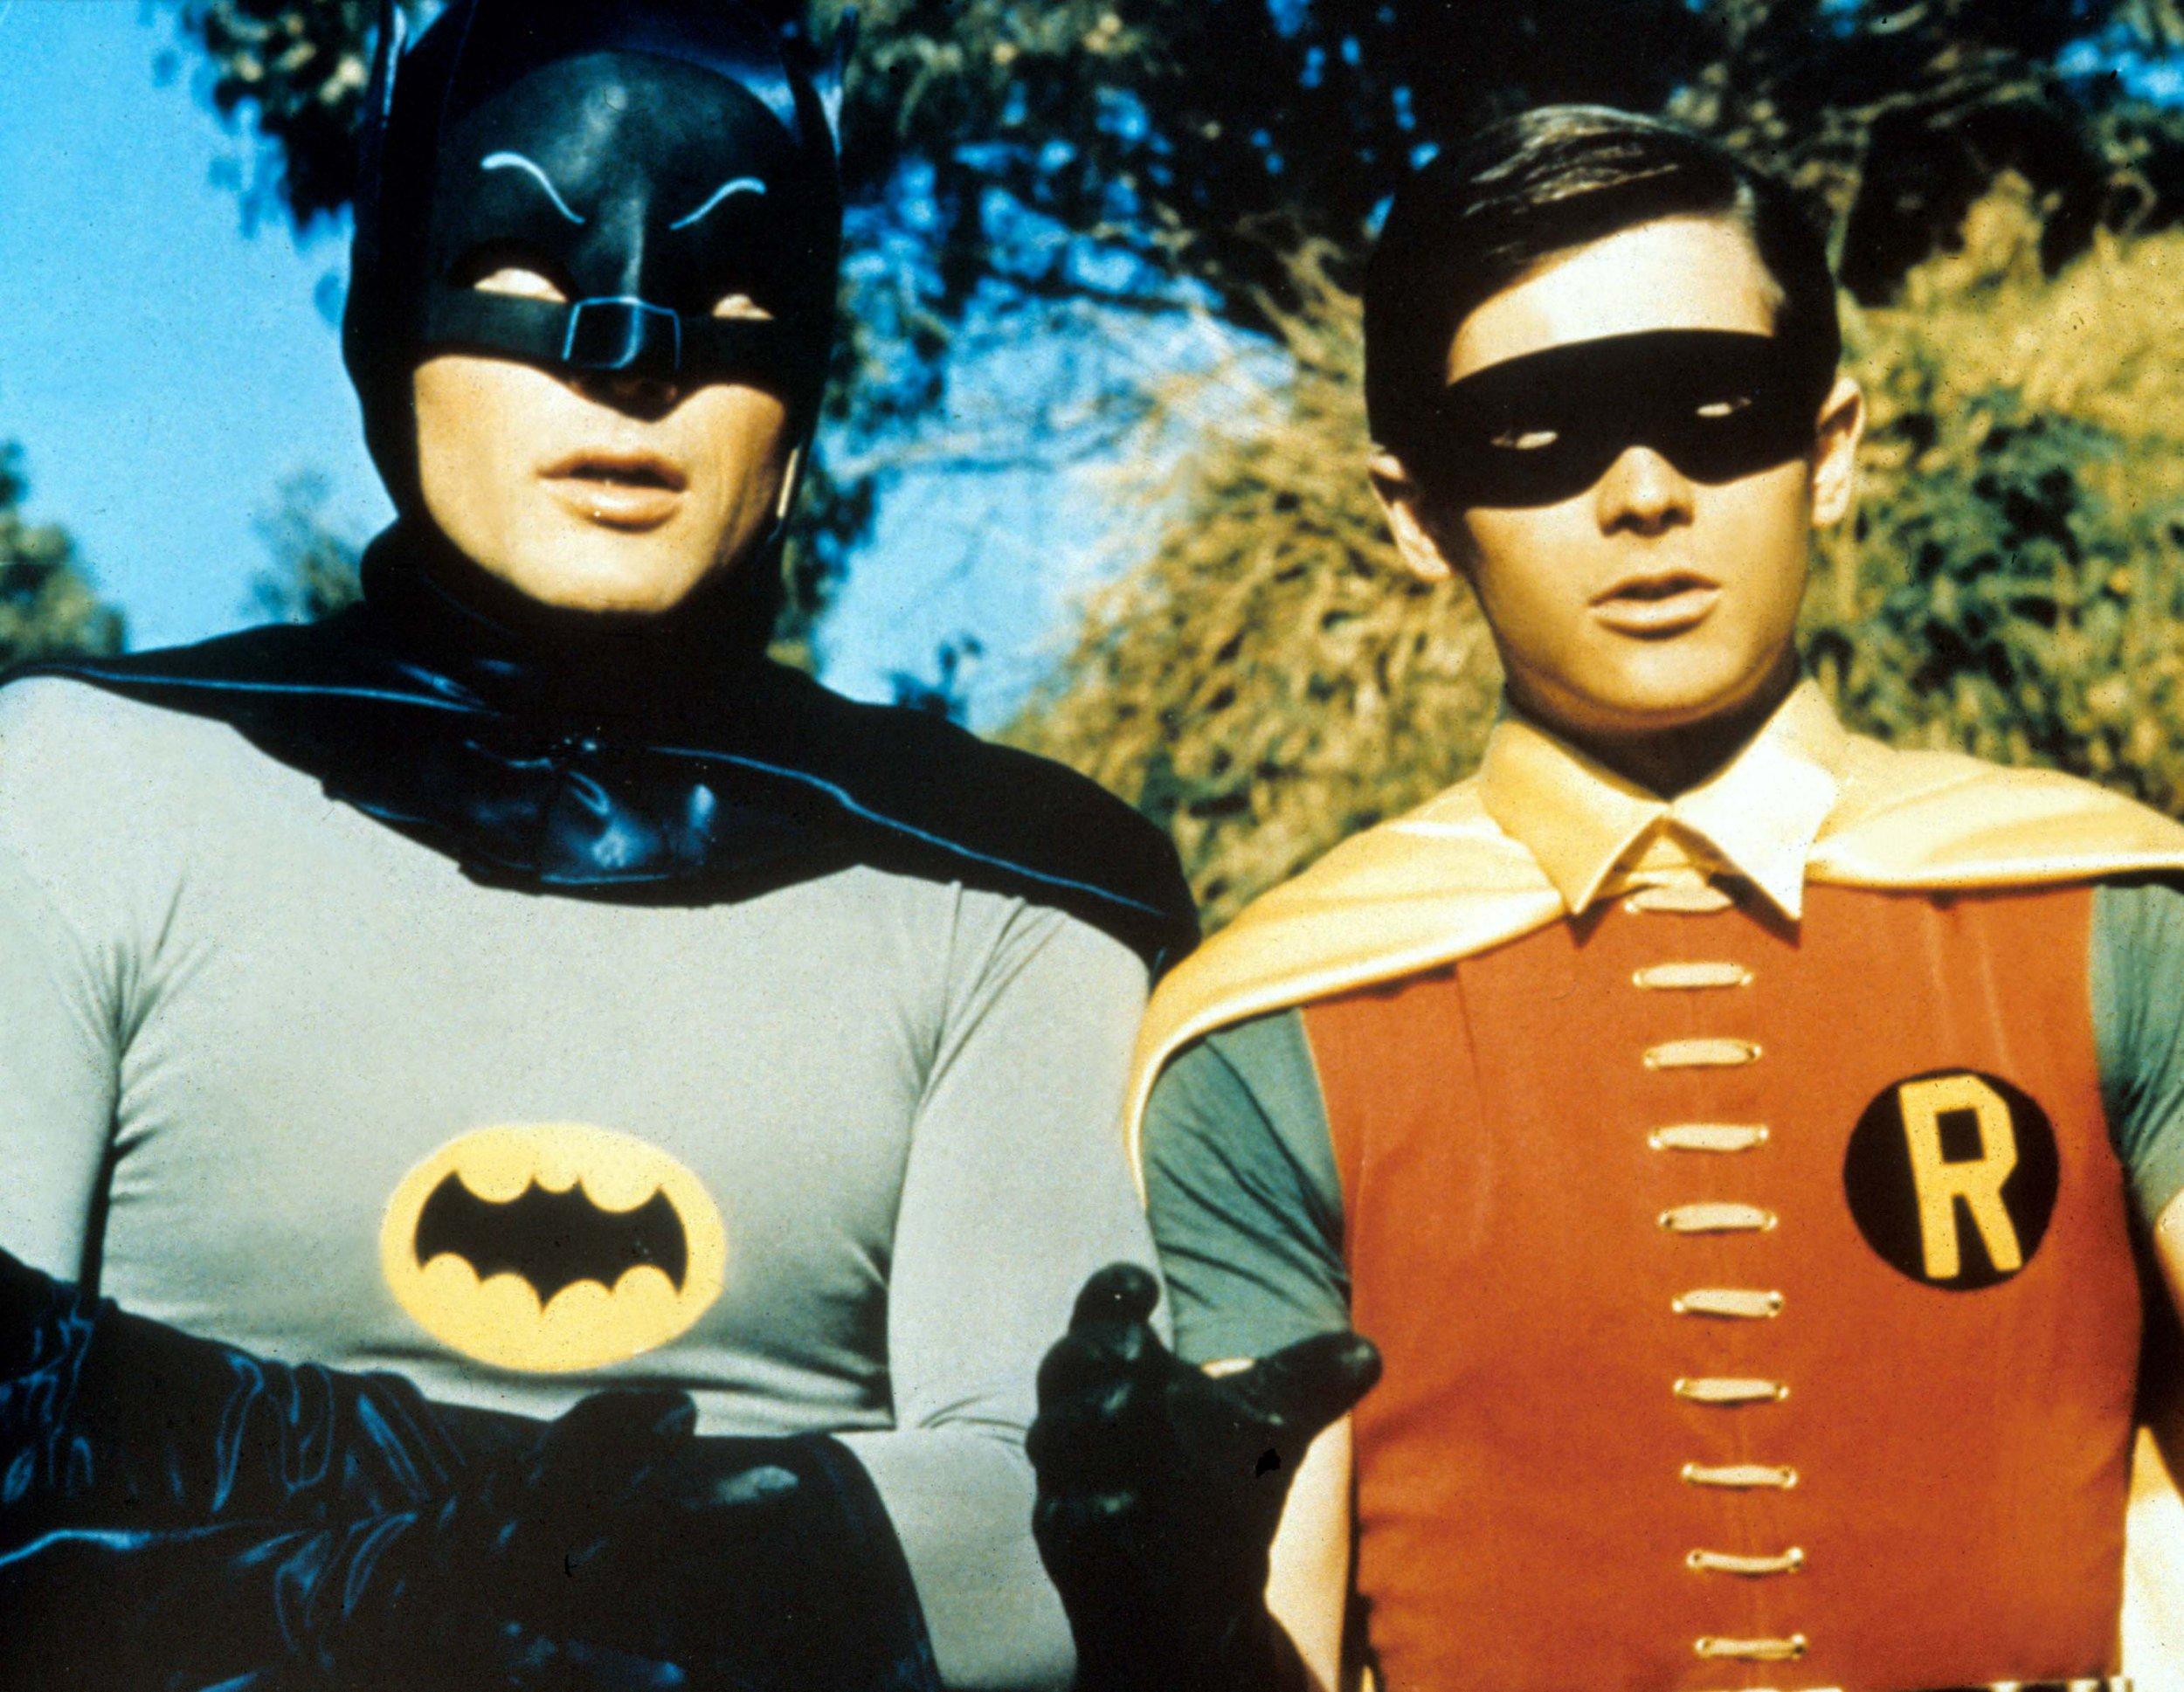 DC Comics post touching tribute to original Batman Adam West